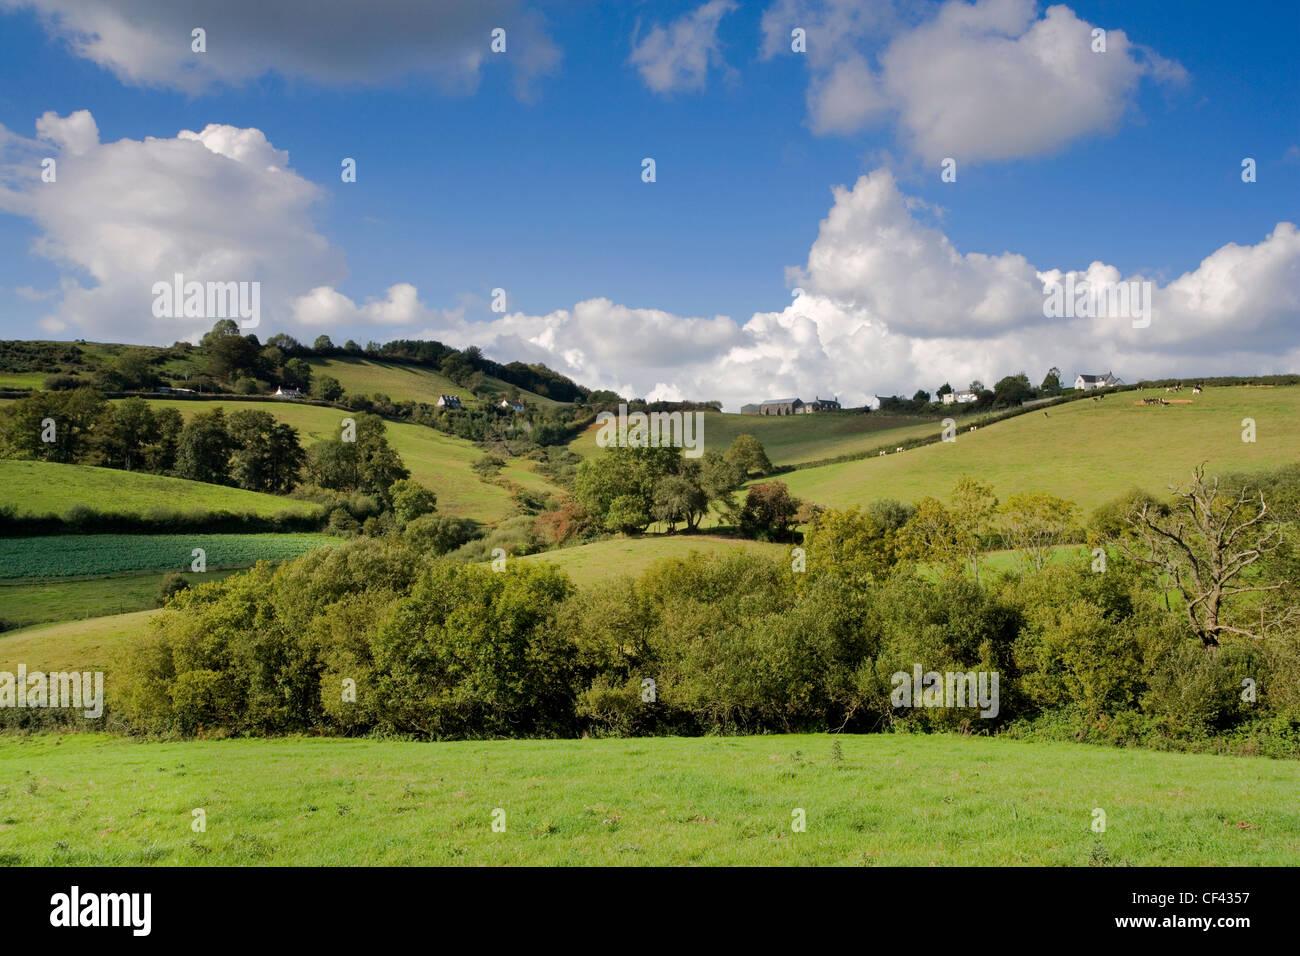 View across a lush green valley towards the Dorset village of Birdsmoorgate. Stock Photo